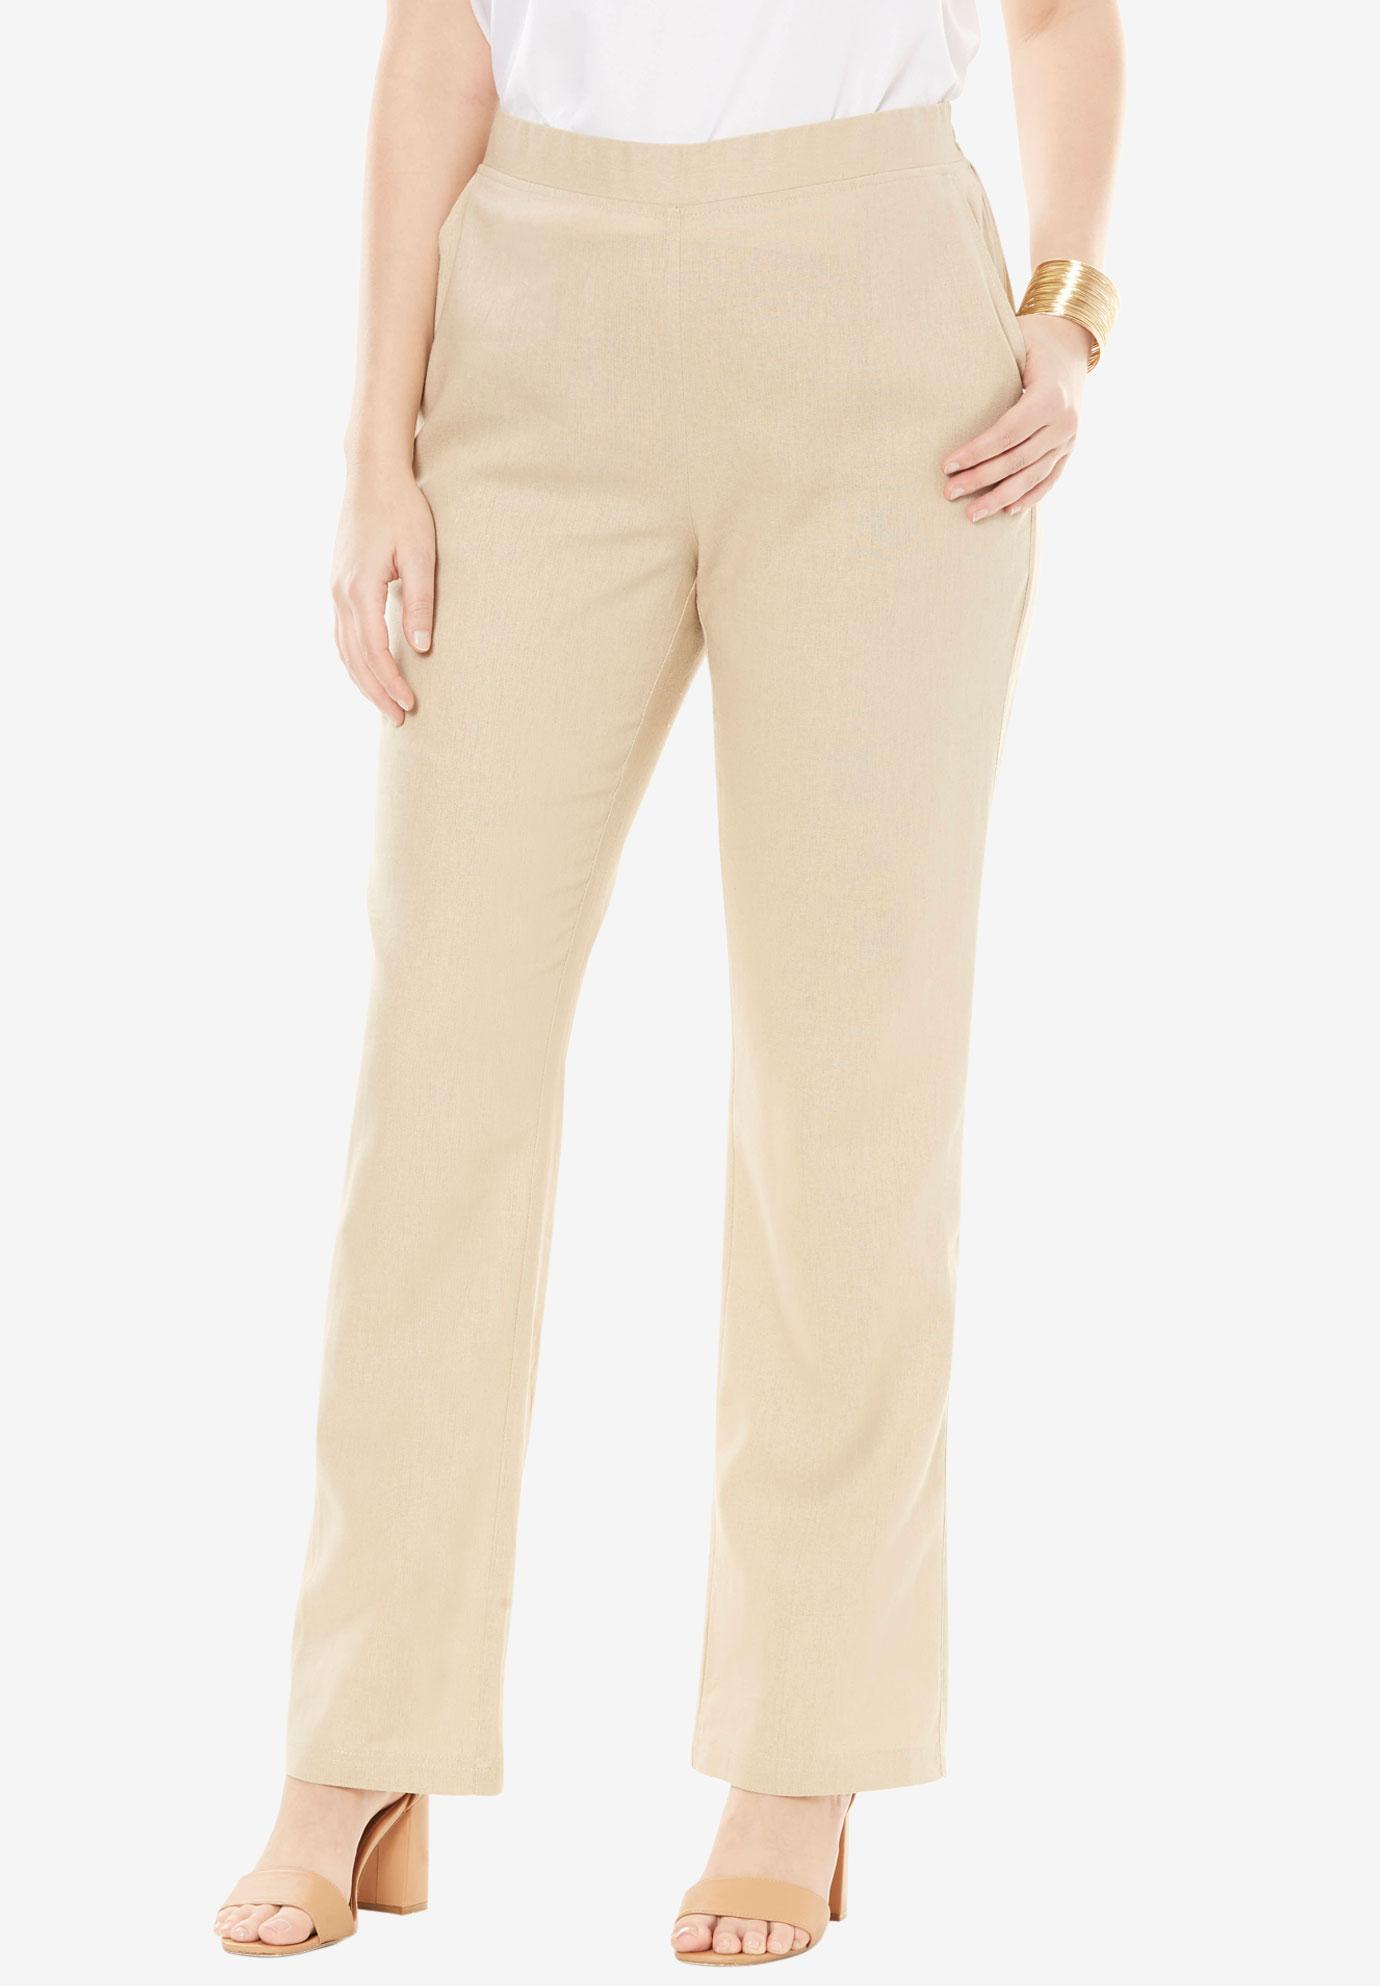 Pull On Linen Pants Plus Size Pants Skirts Jessica London